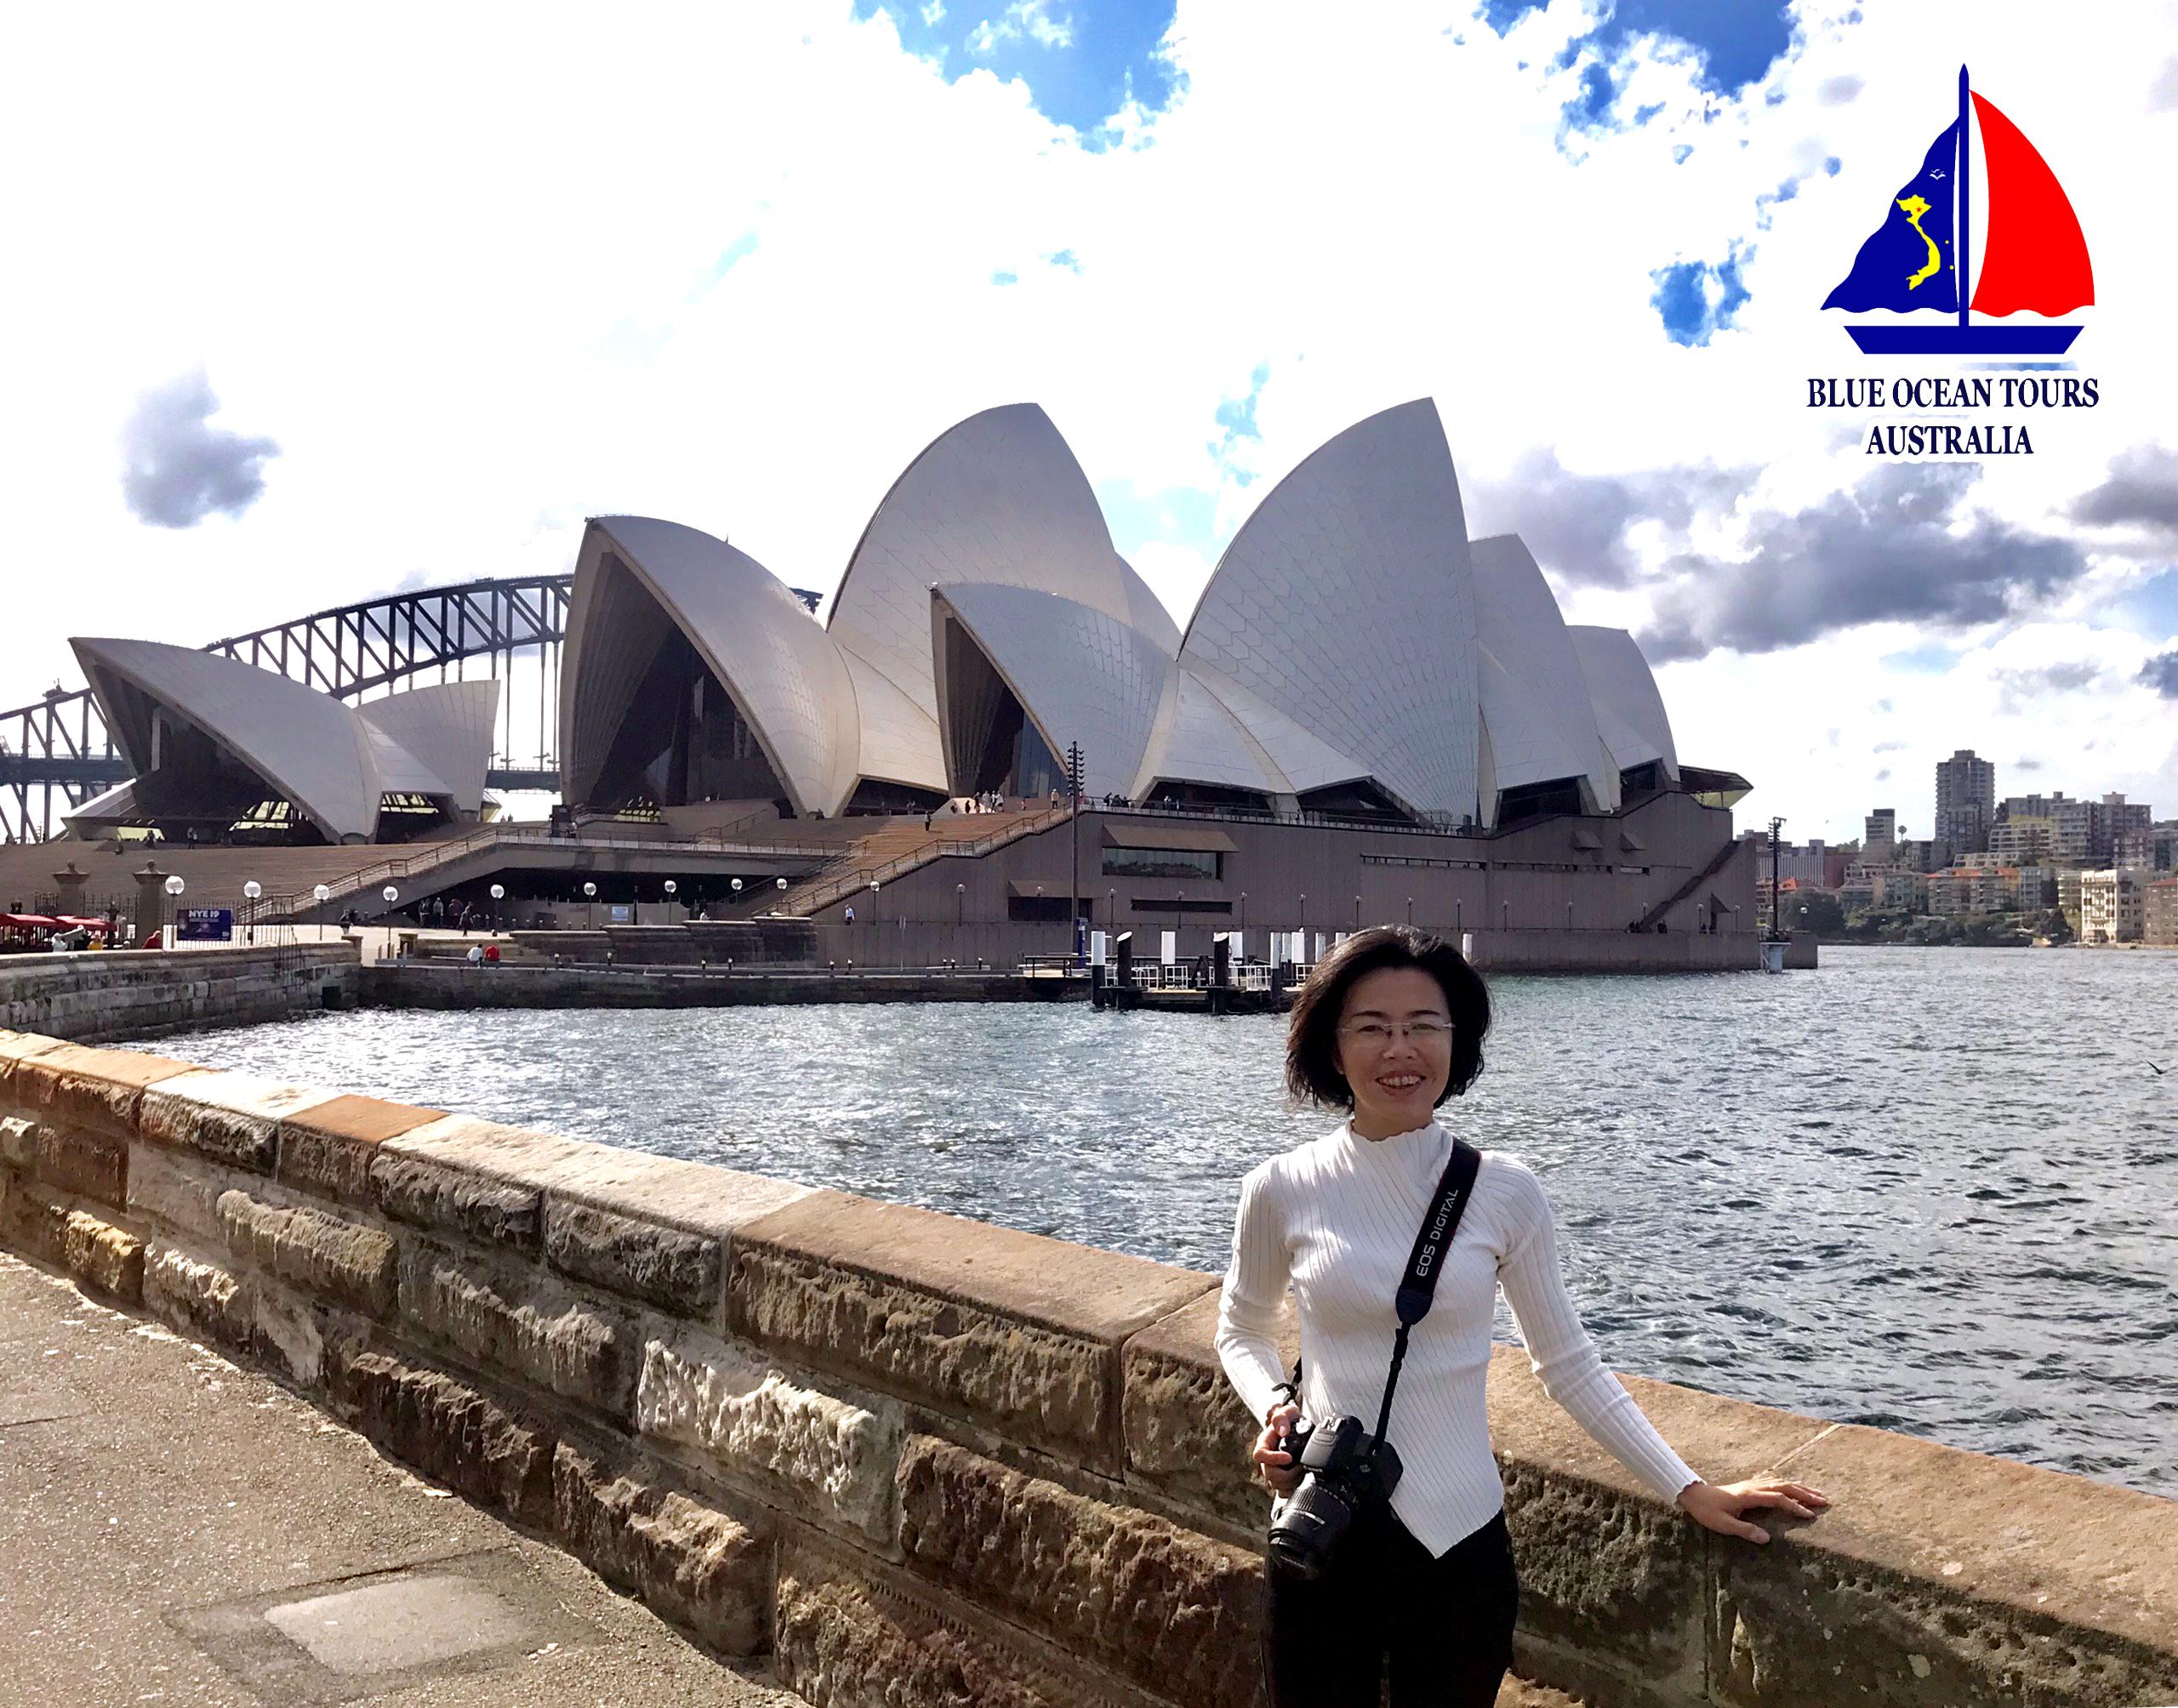 Sydney Opera House nhìn từ xa